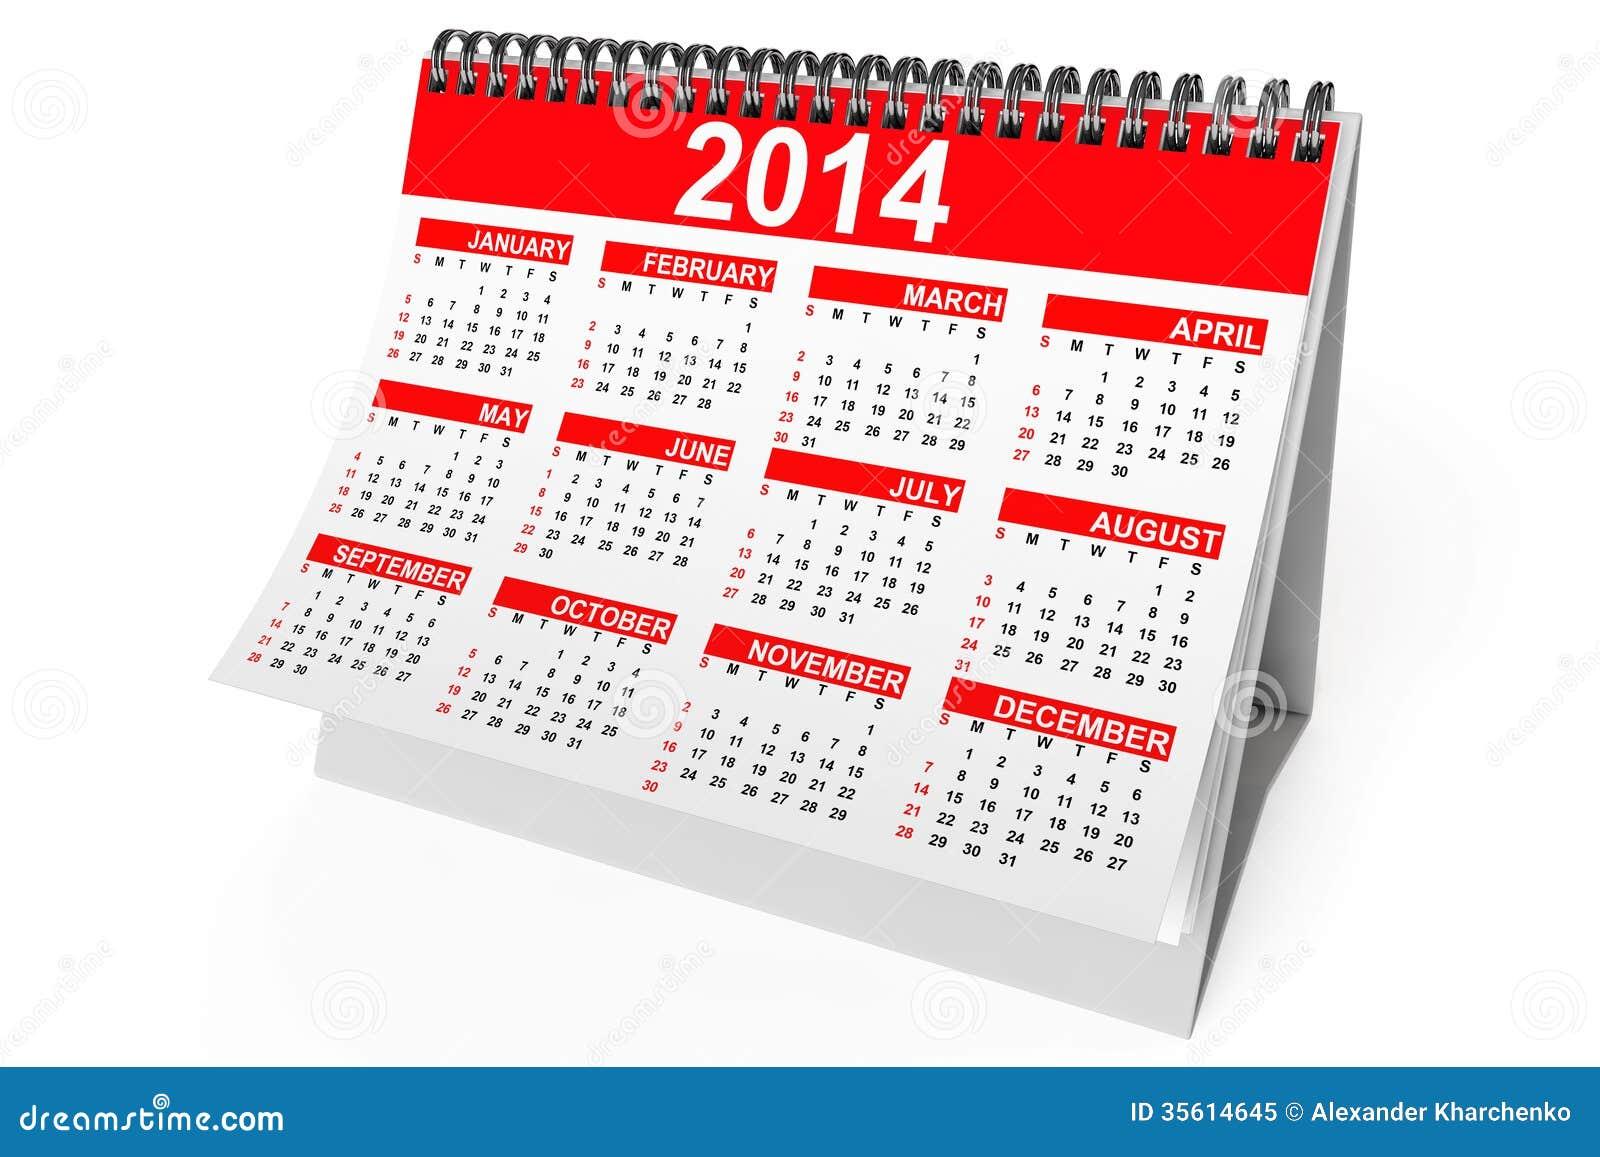 2014 Year Desktop Calendar Royalty Free Stock Photo